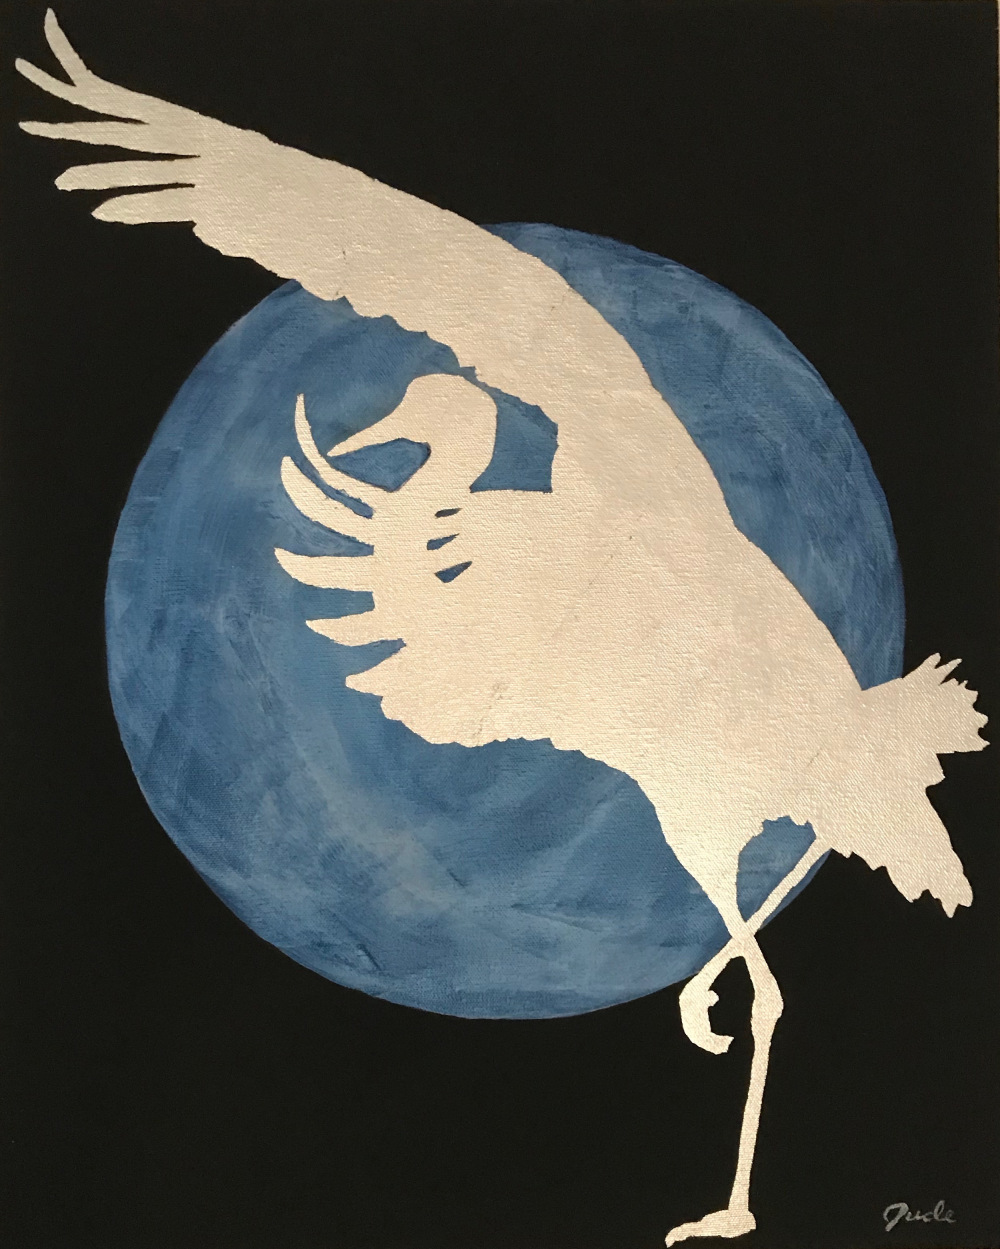 blue-moon-3-16-x-2022-jude-martindale.jpeg